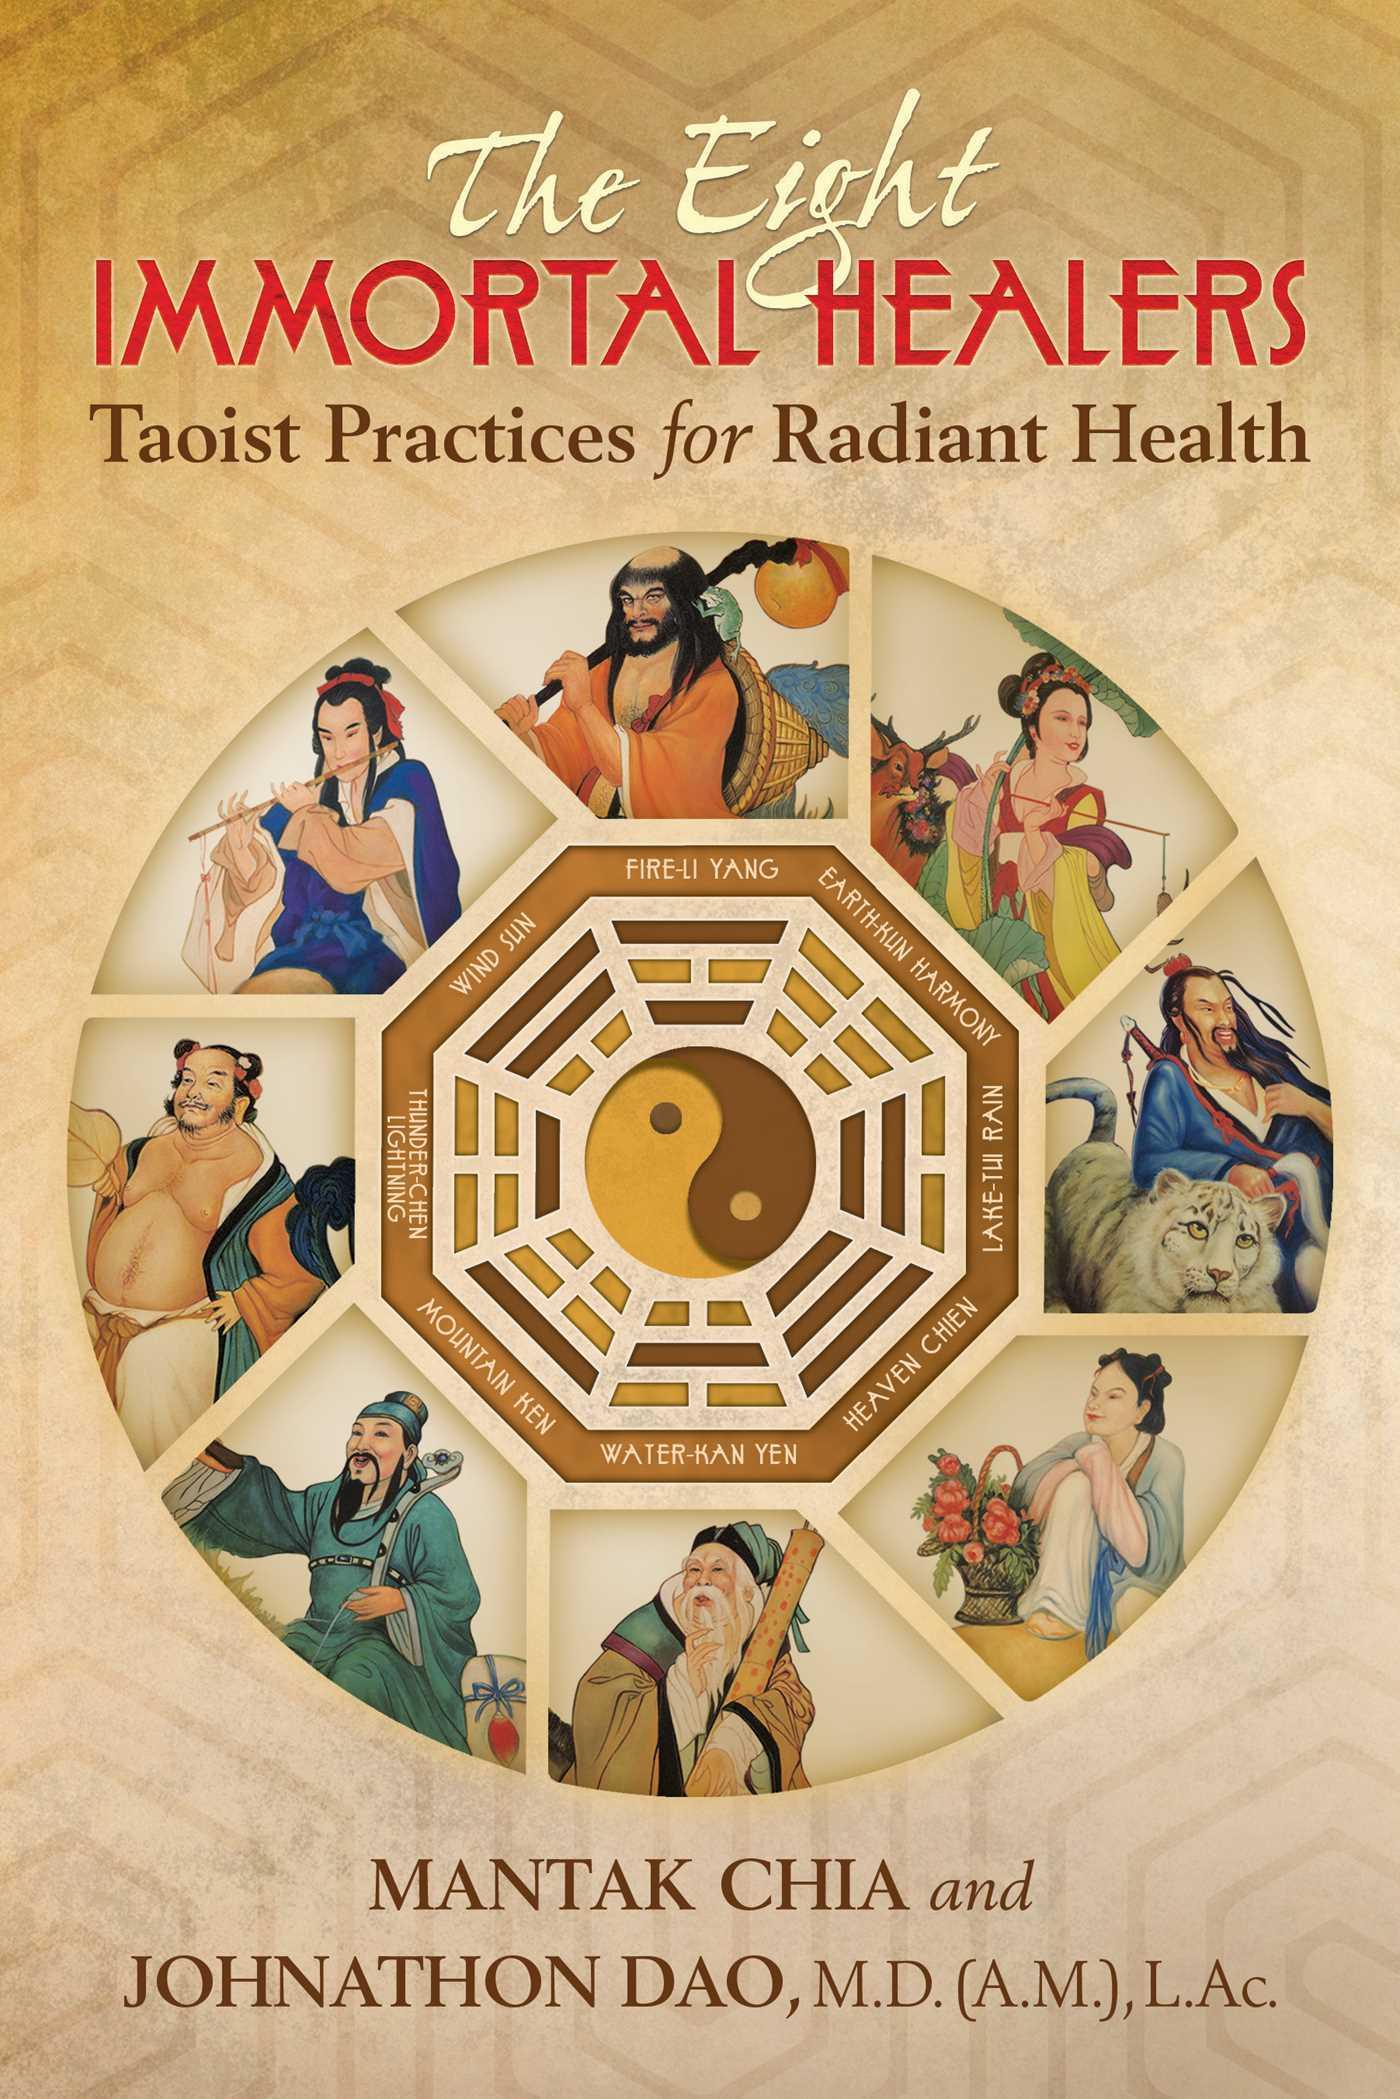 The Eight Immortal Healers Taoist Wisdom for Radiant Health